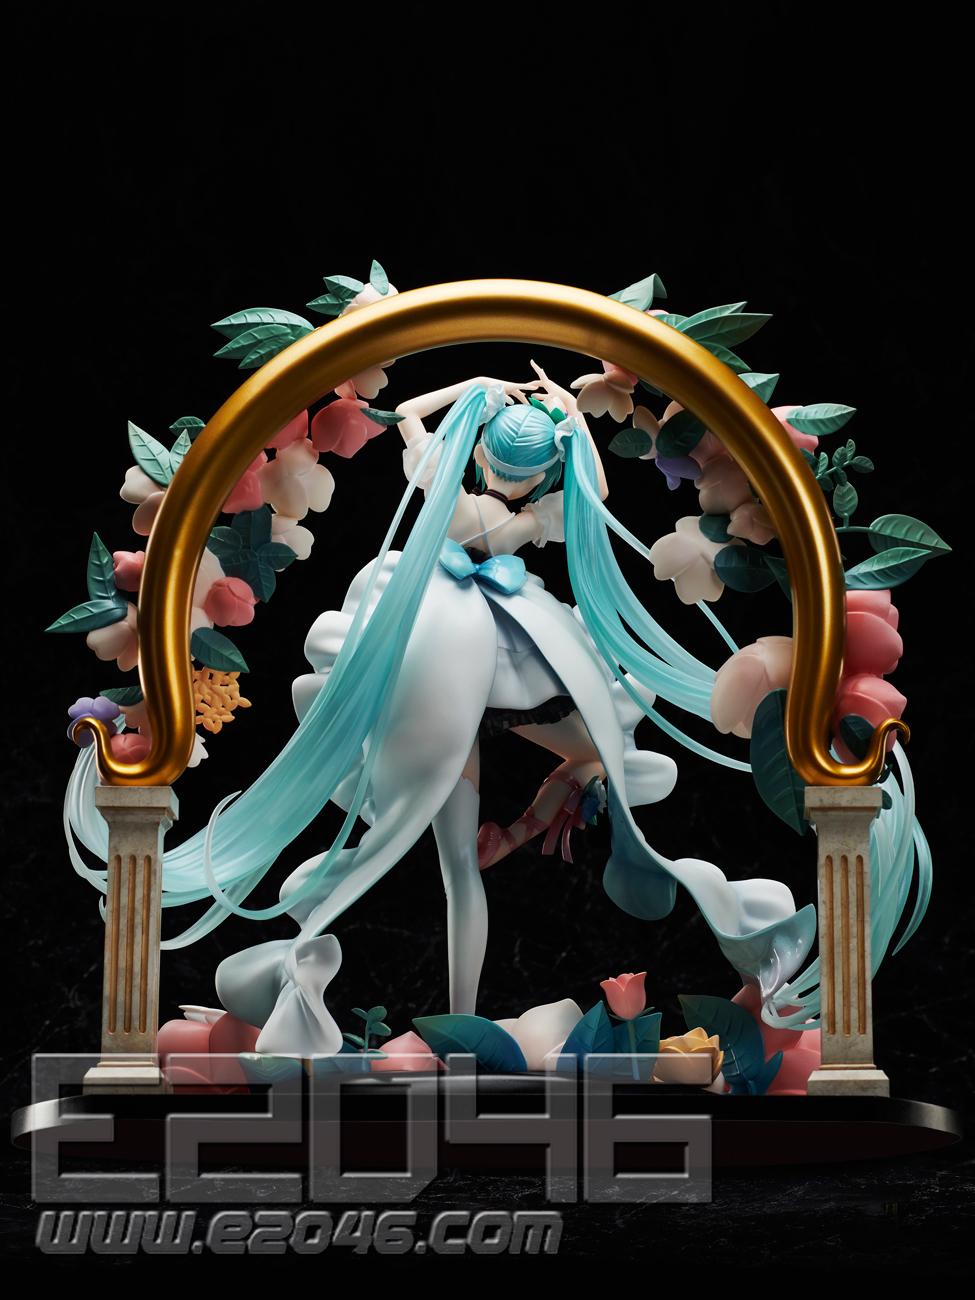 Hatsune Miku MIKU WITH YOU 2019 Version (PVC)